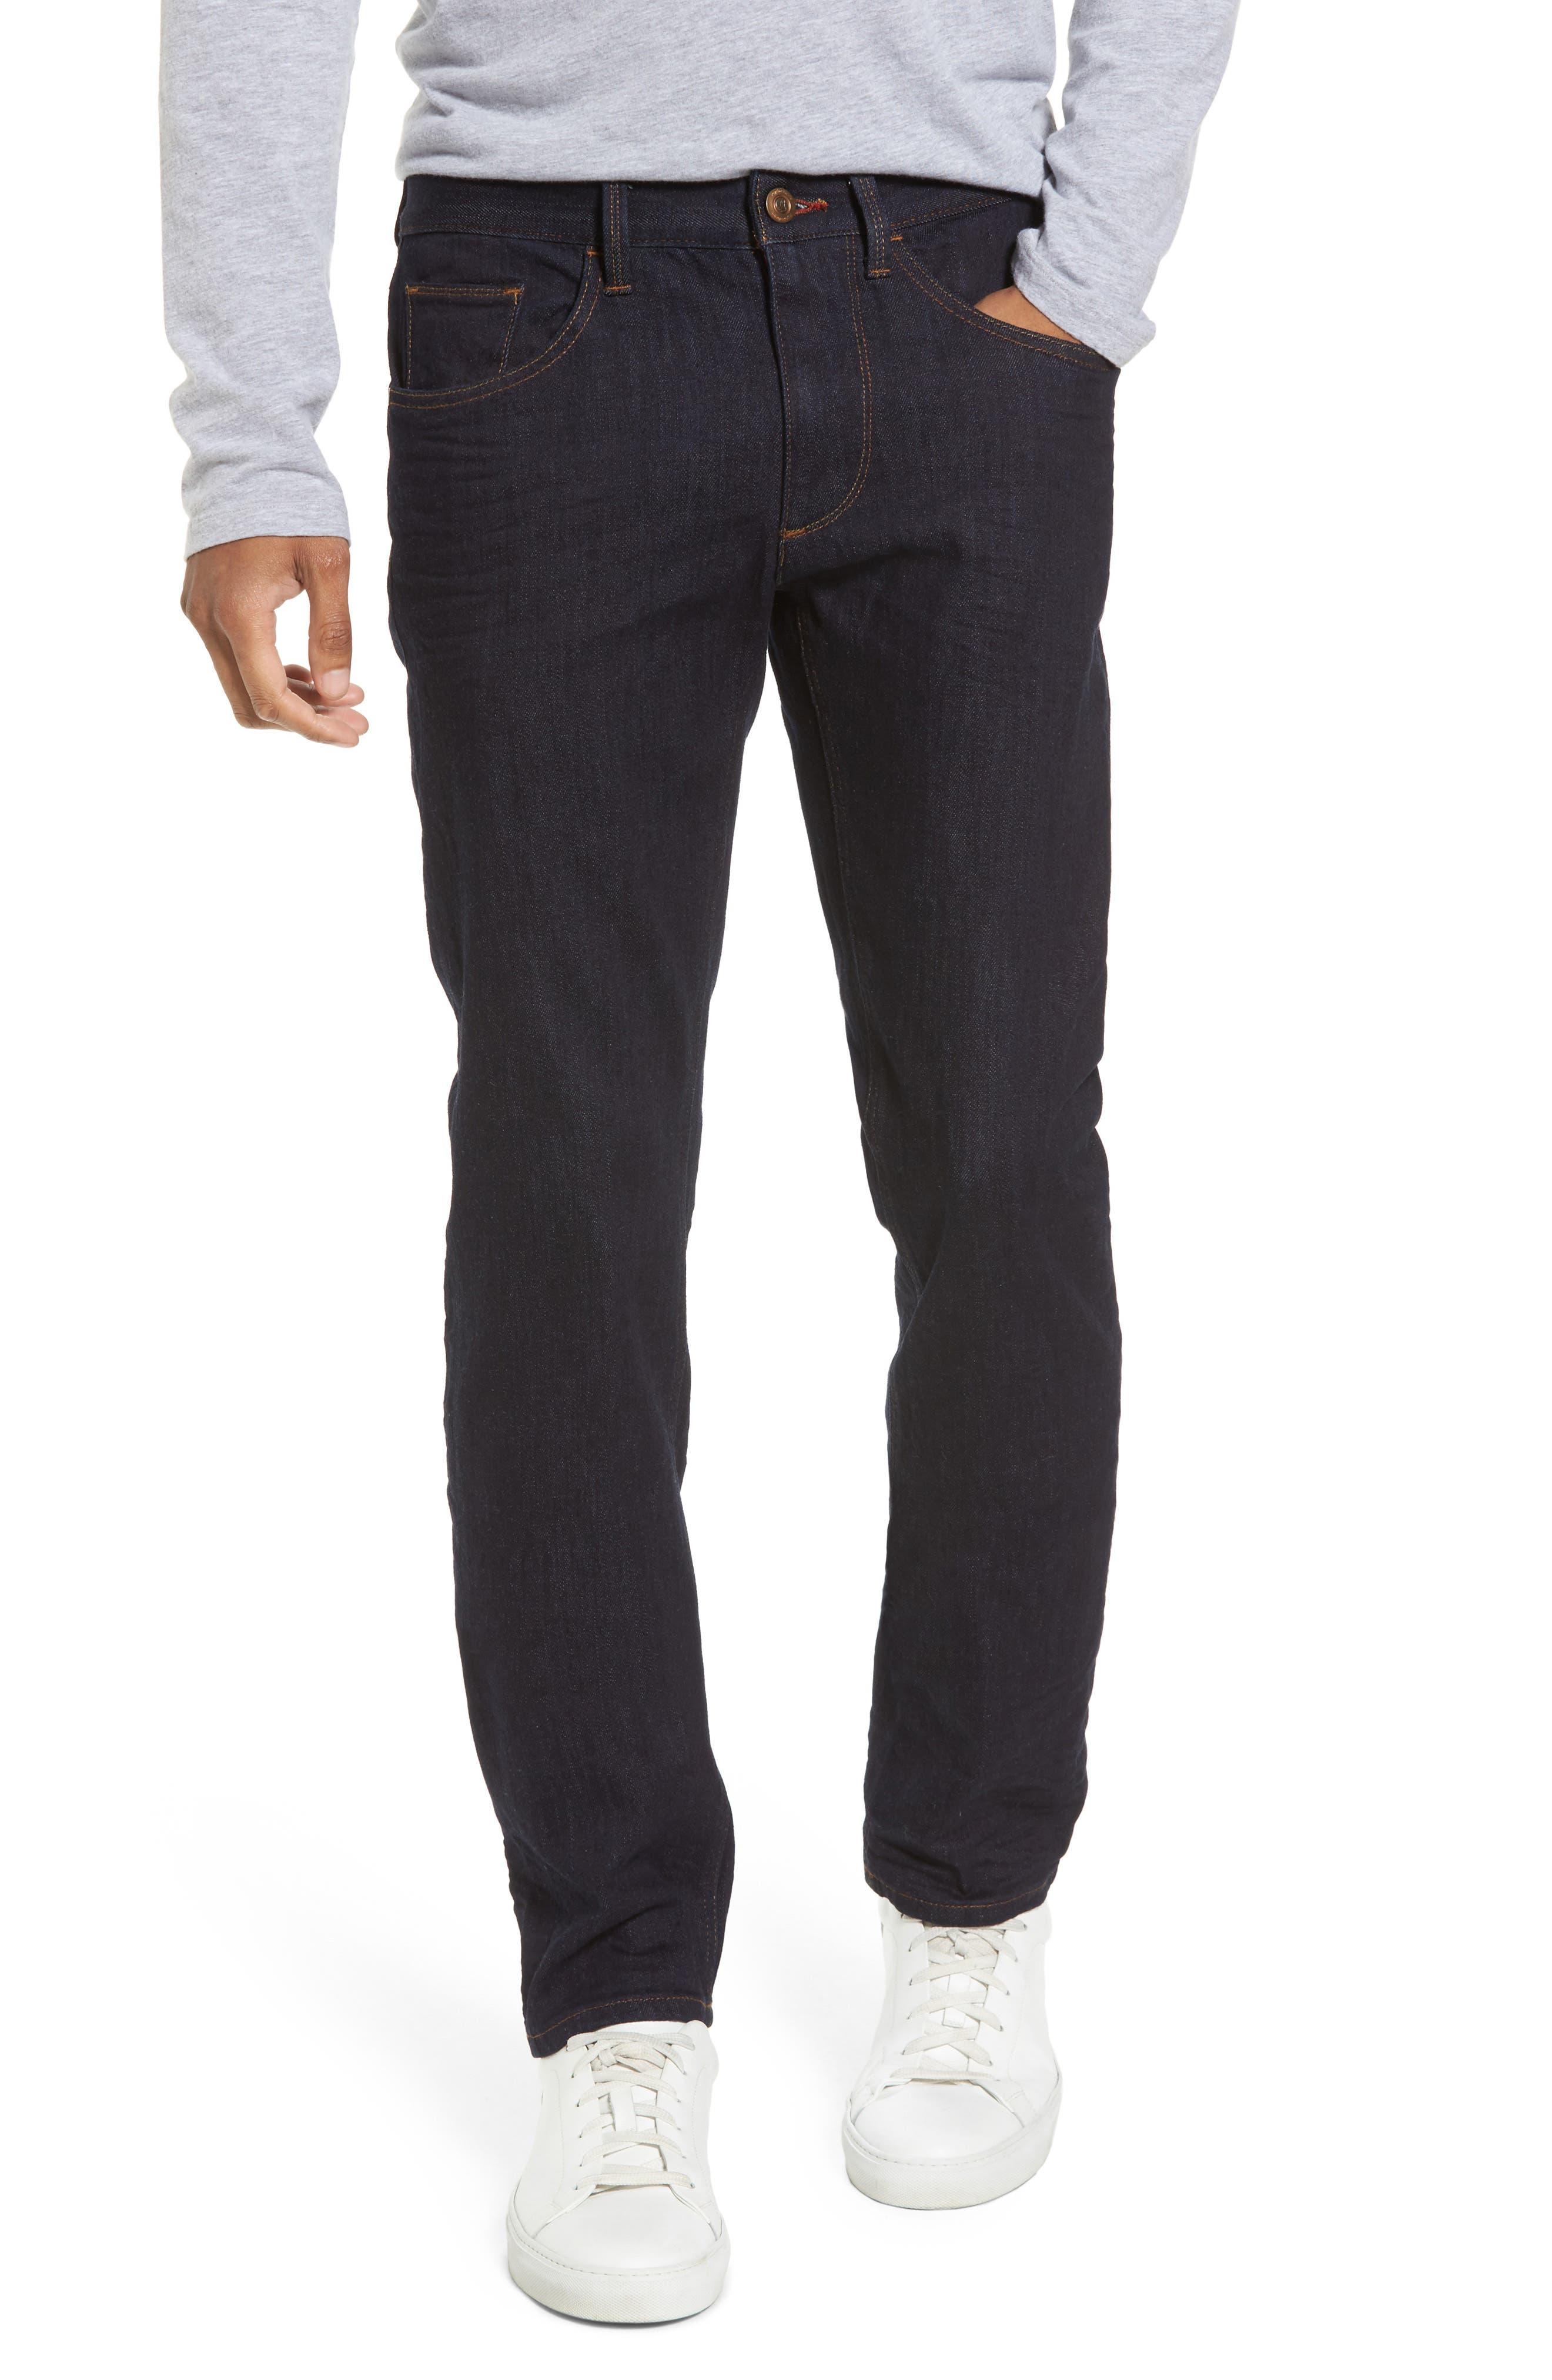 Canal Slim Fit Jeans,                         Main,                         color, 460